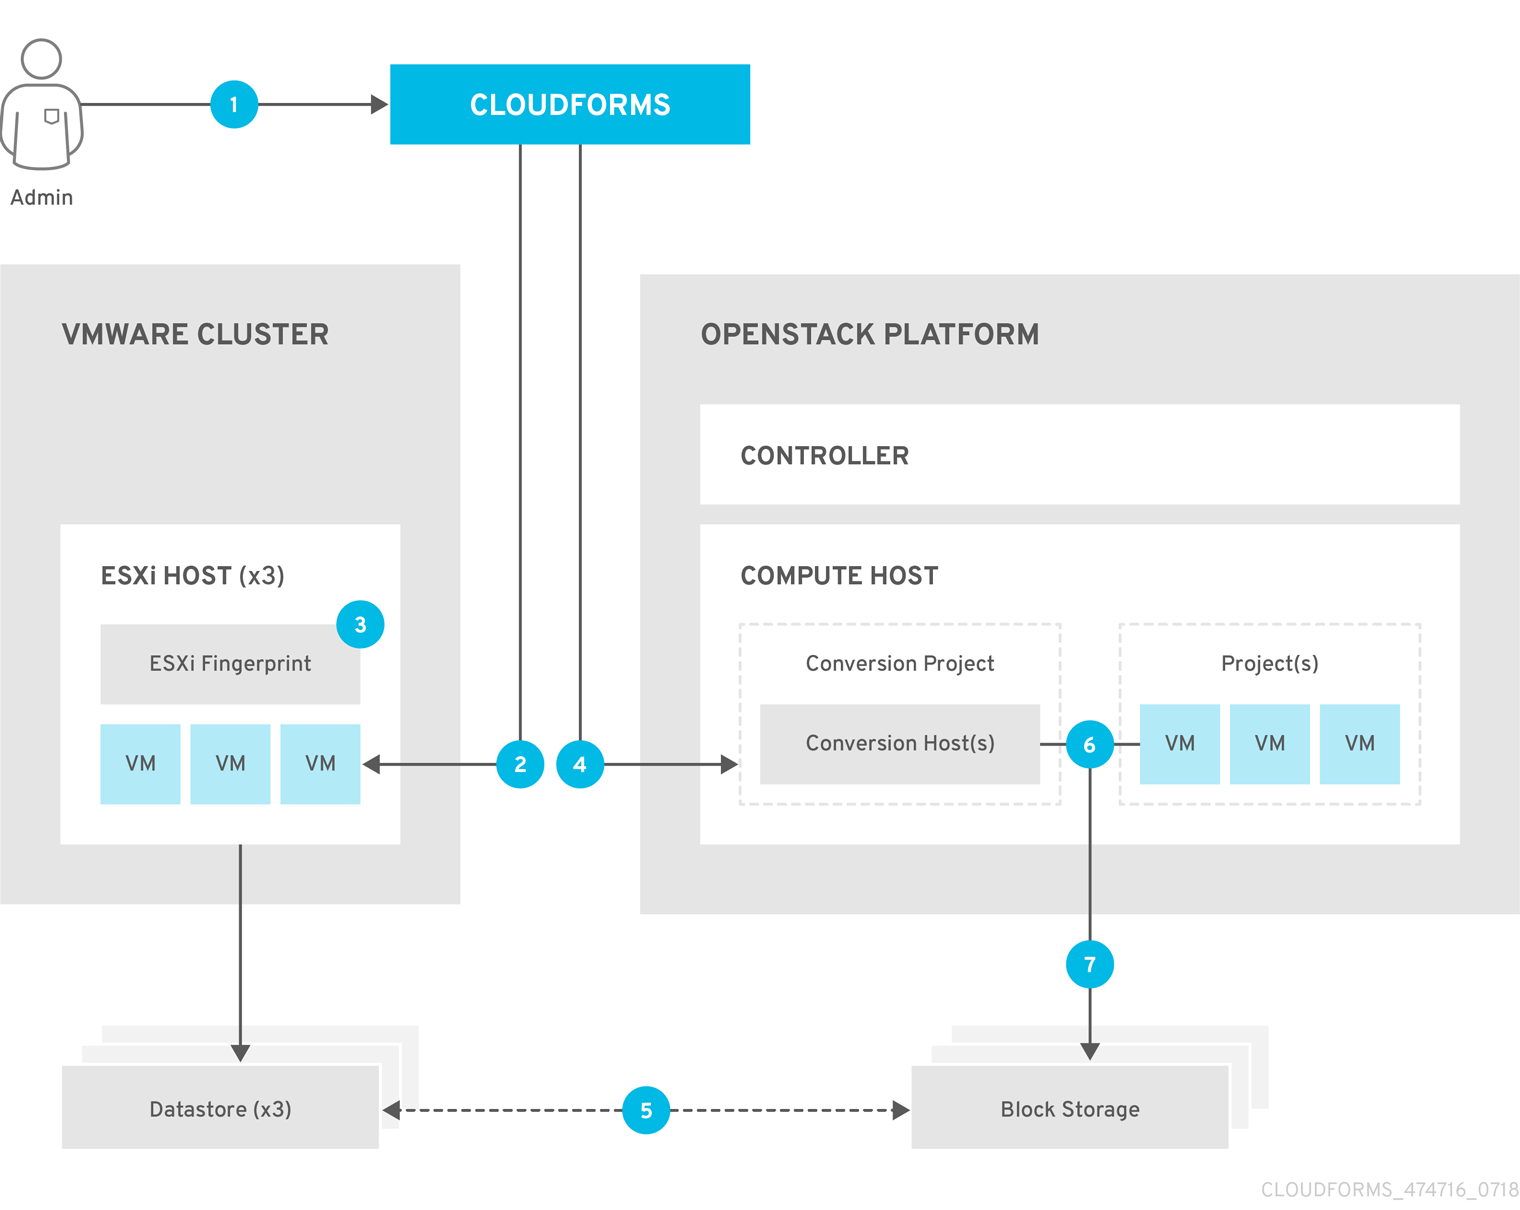 vmware to osp migration workflow